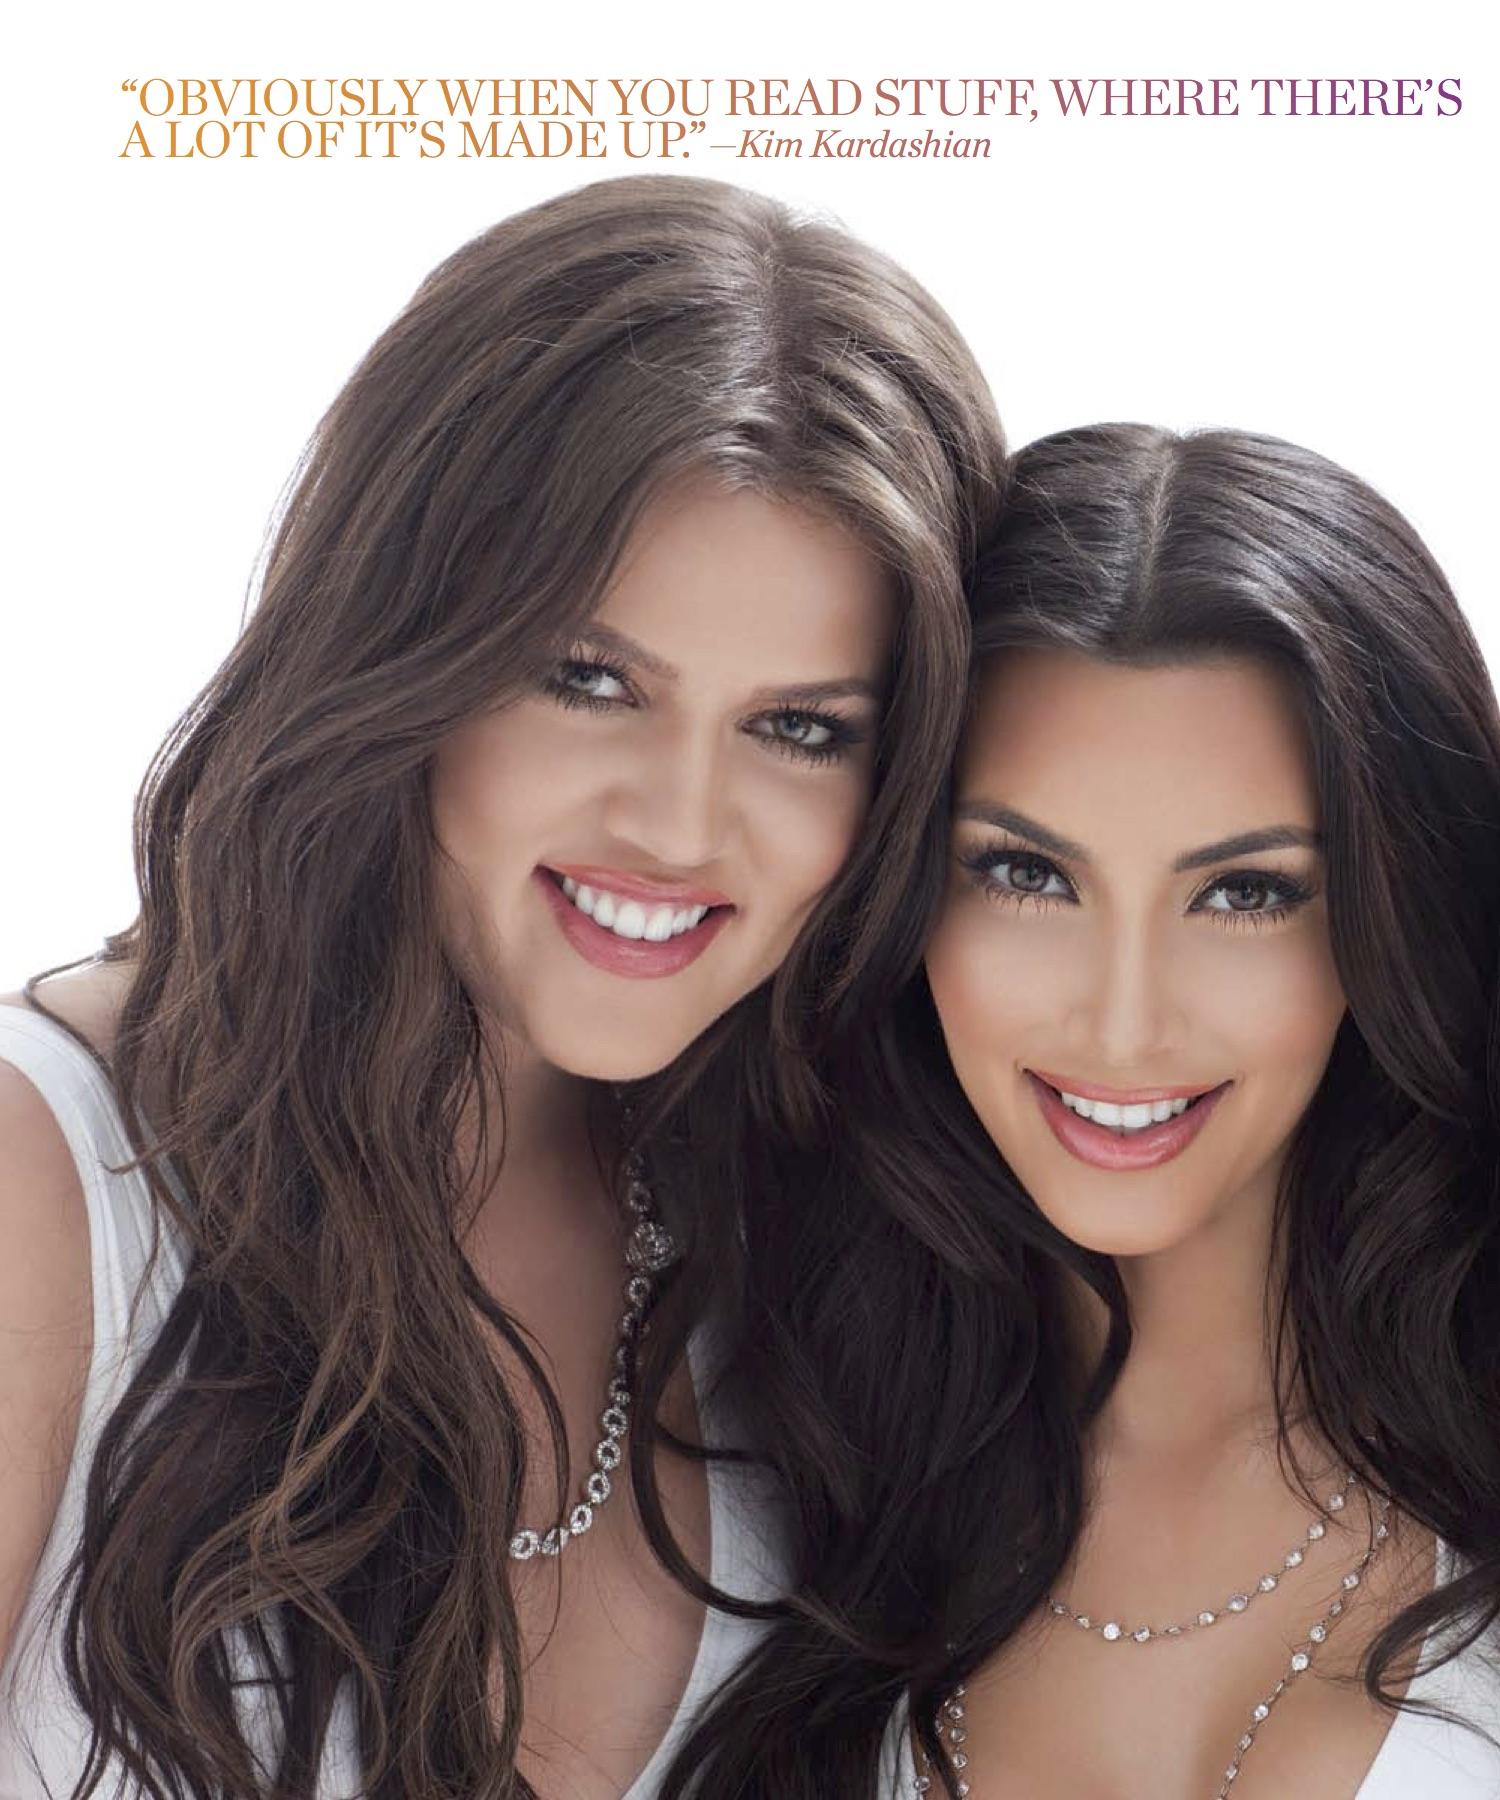 Kardashians3.jpg